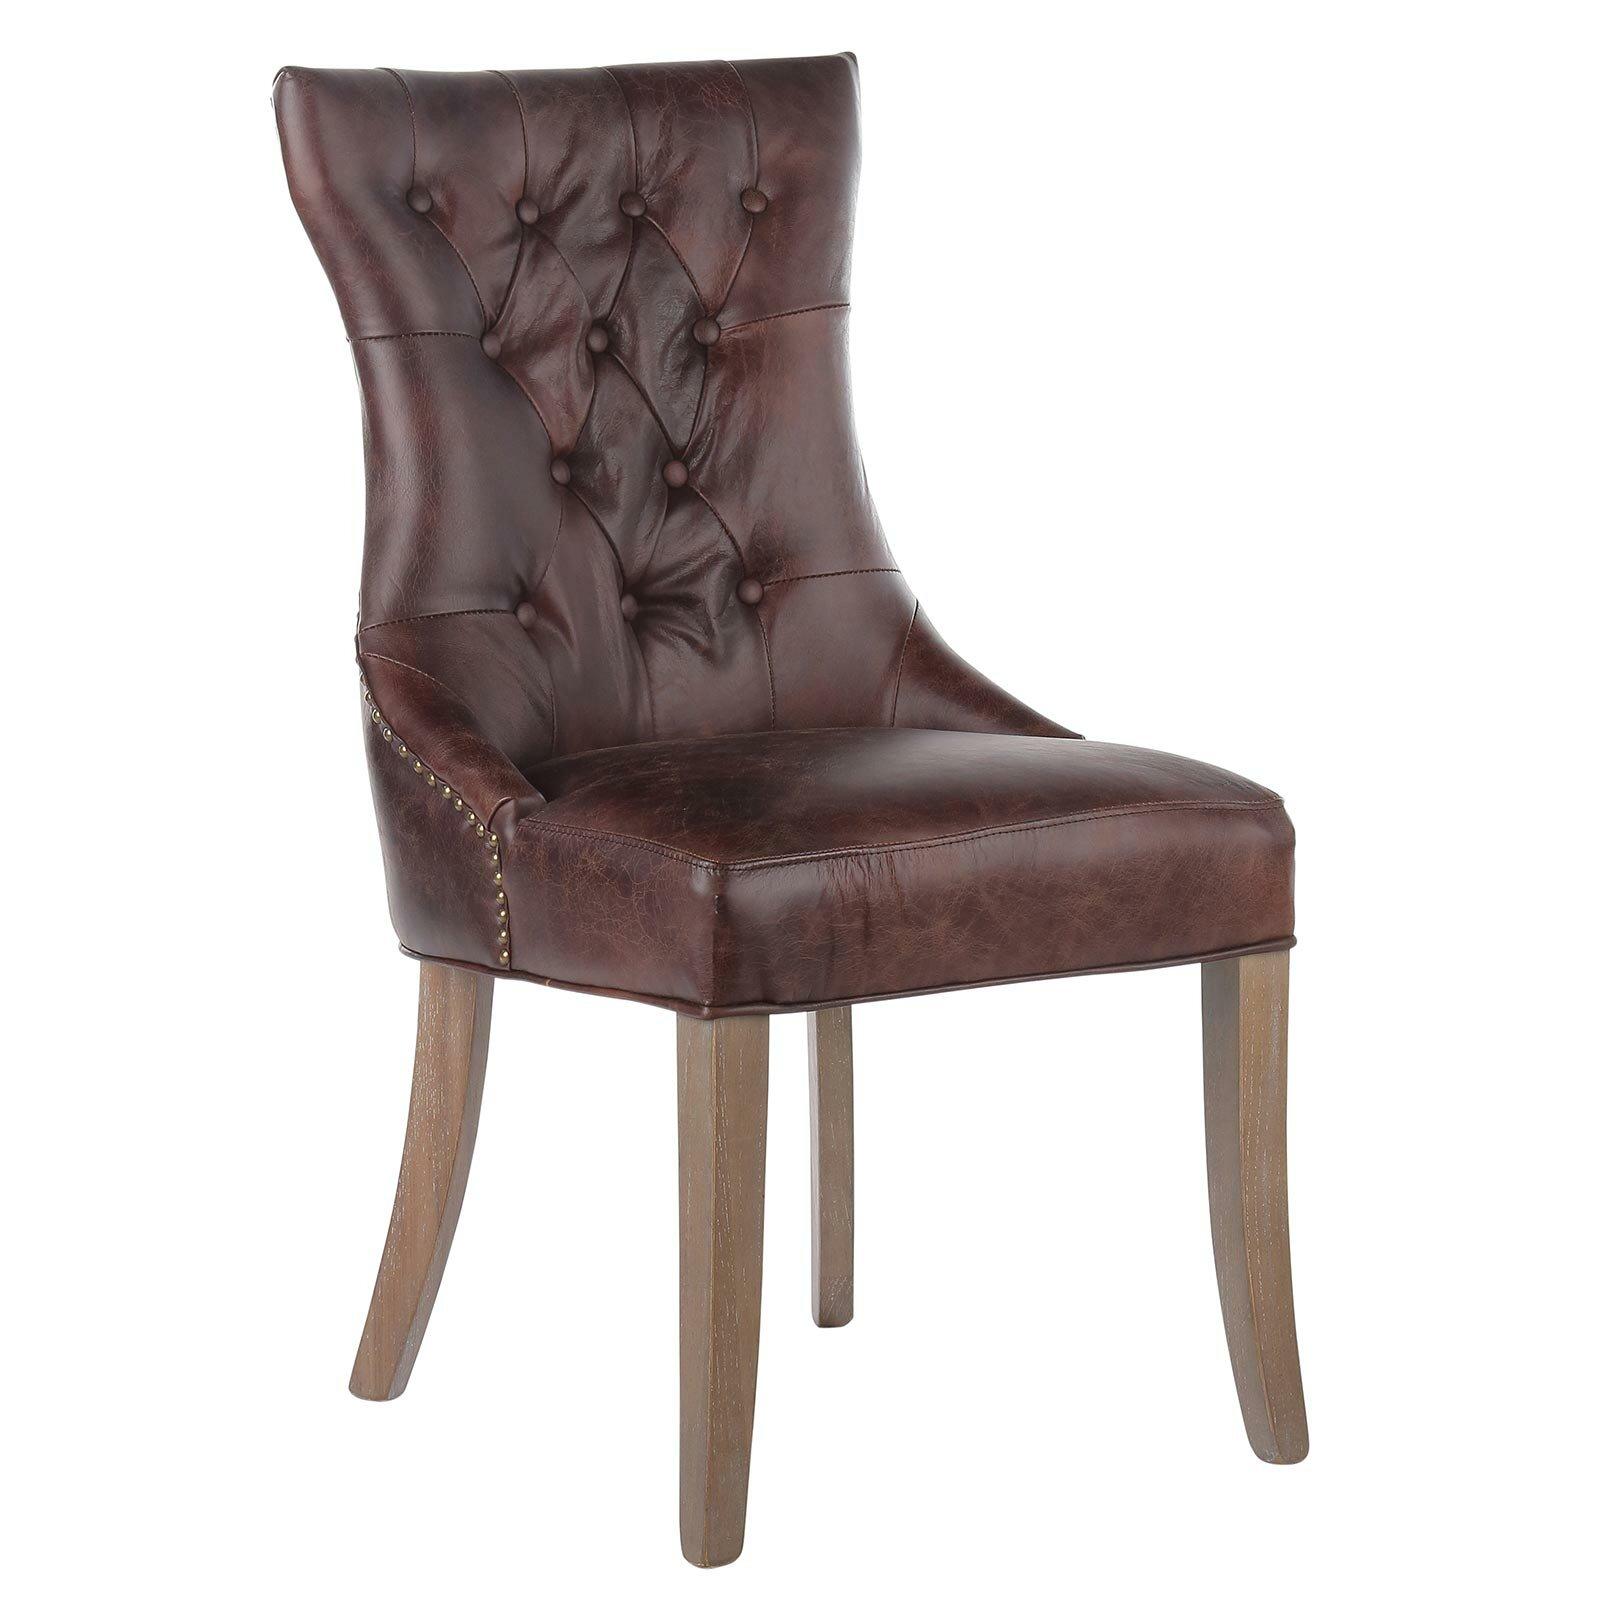 joseph allen mustang tufted genuine leather upholstered dining chair. Black Bedroom Furniture Sets. Home Design Ideas